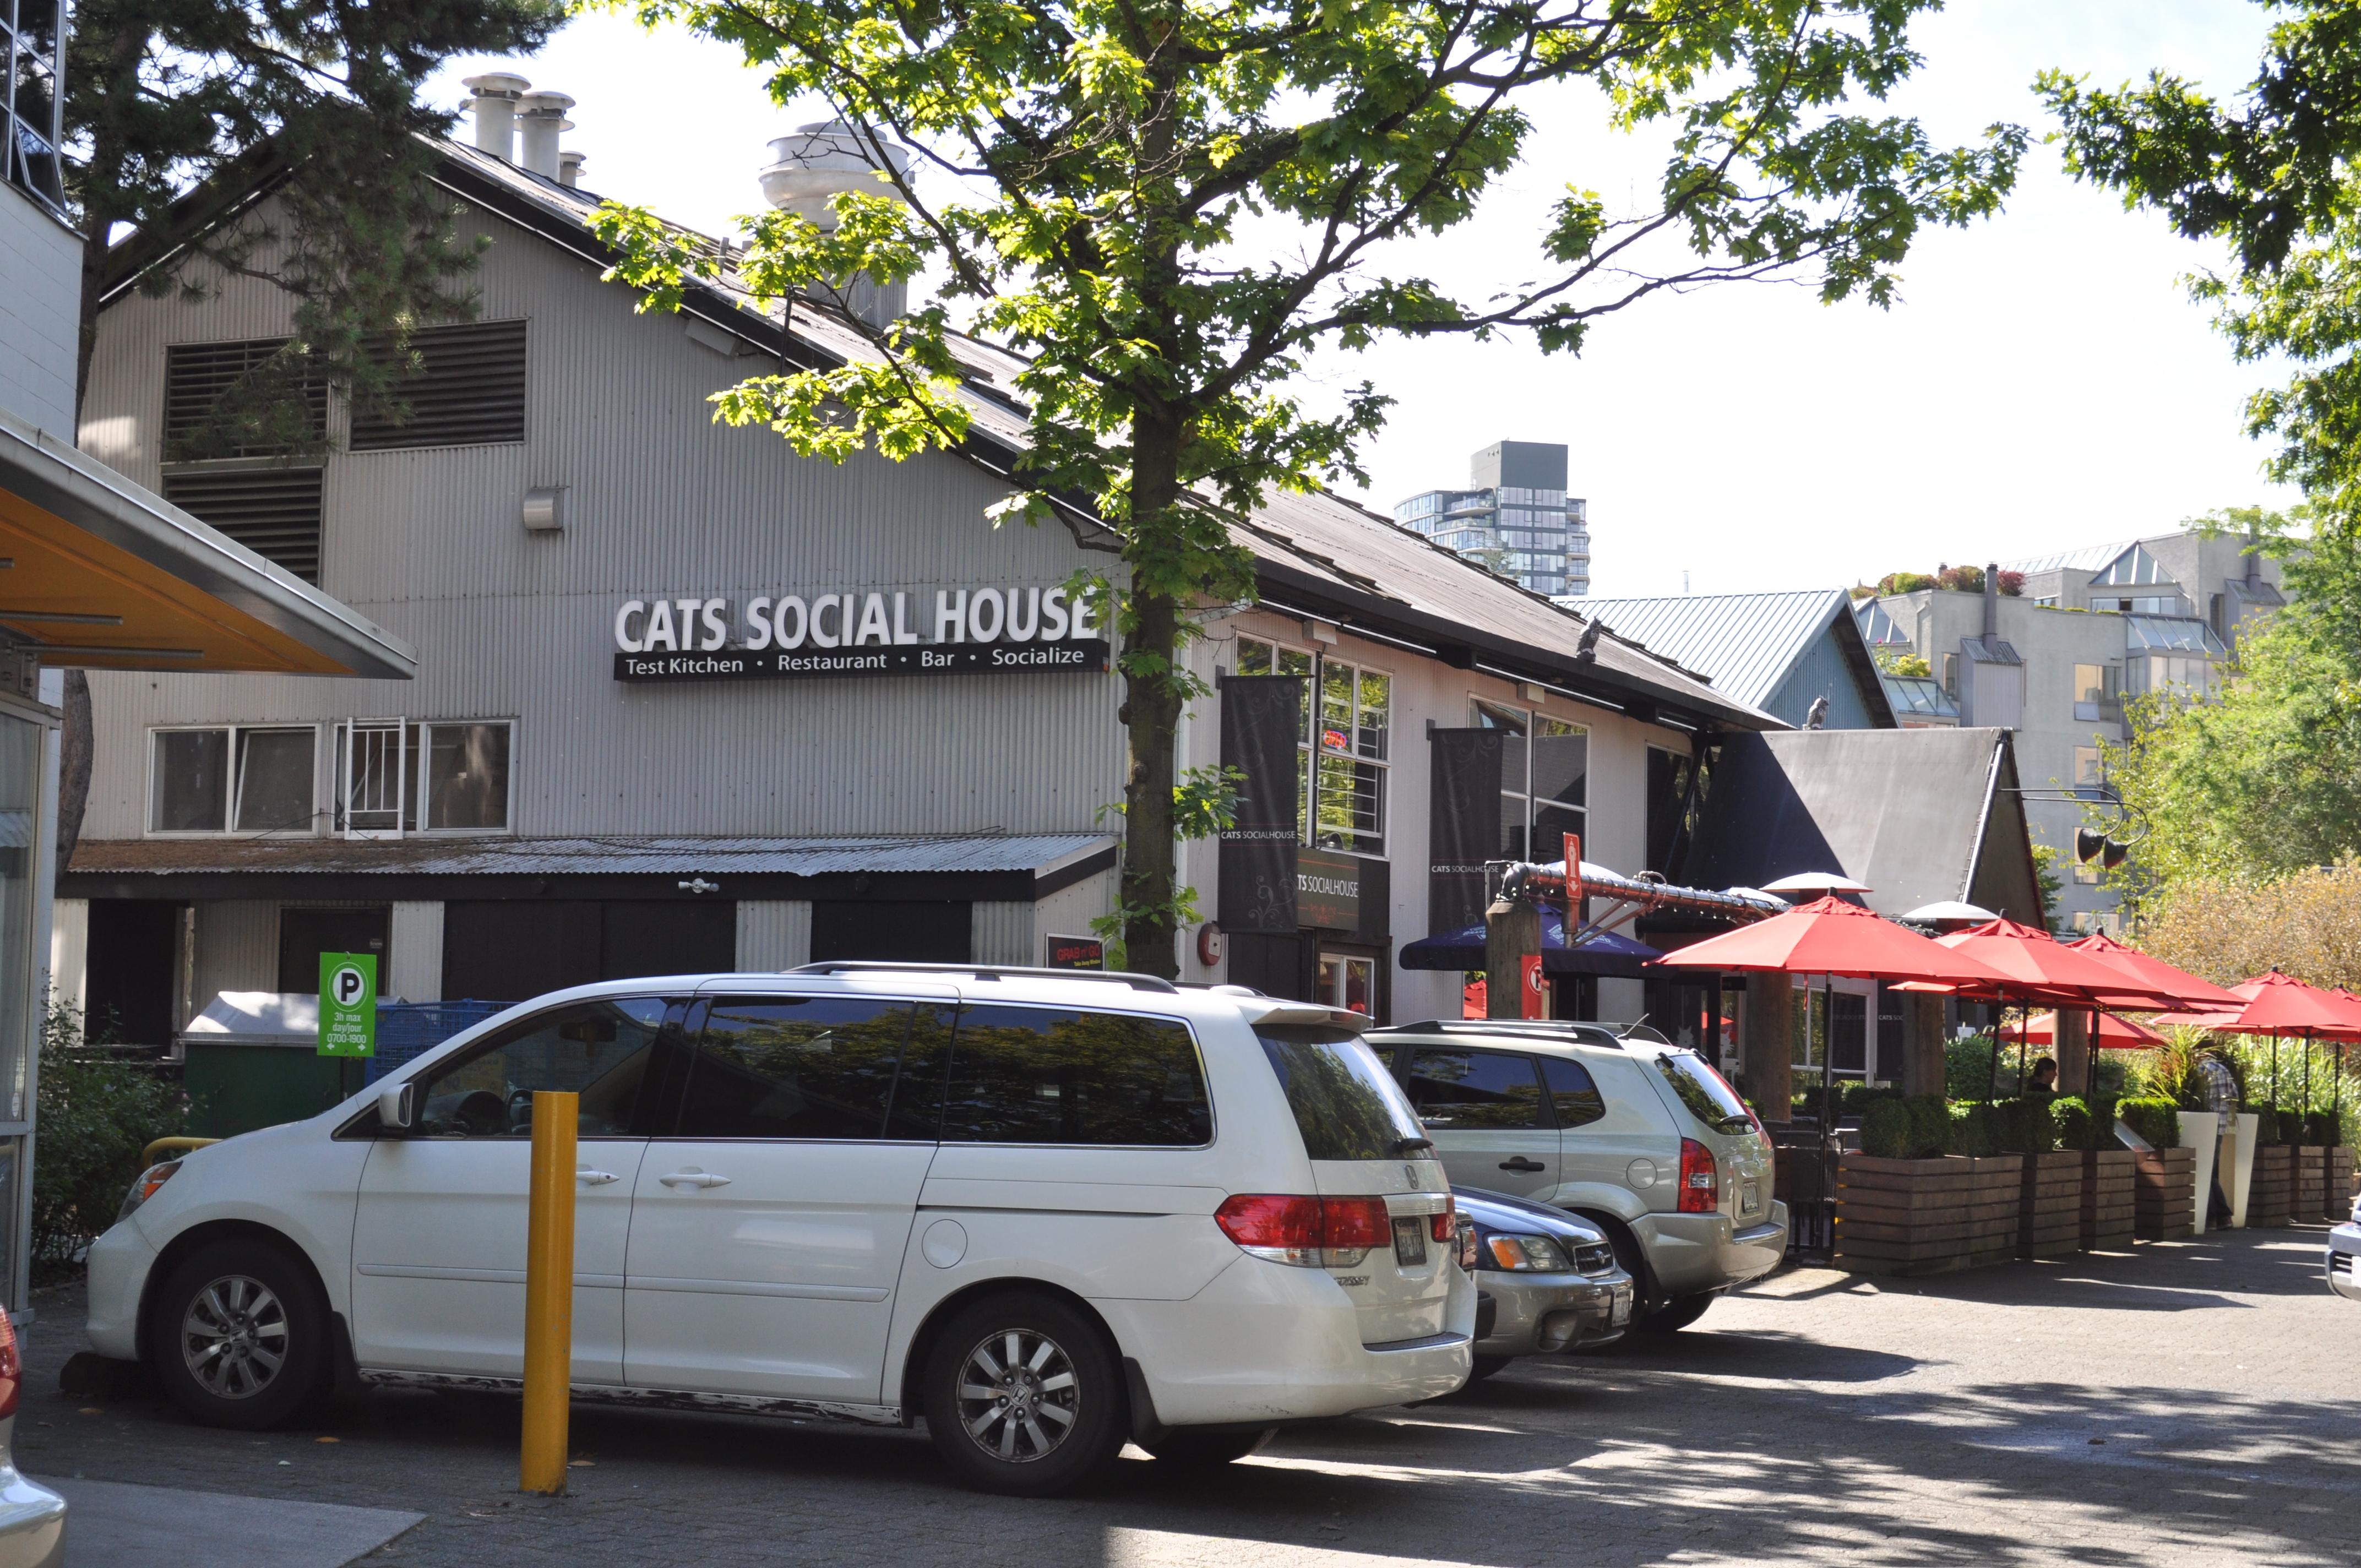 Granville Island Cats Social House